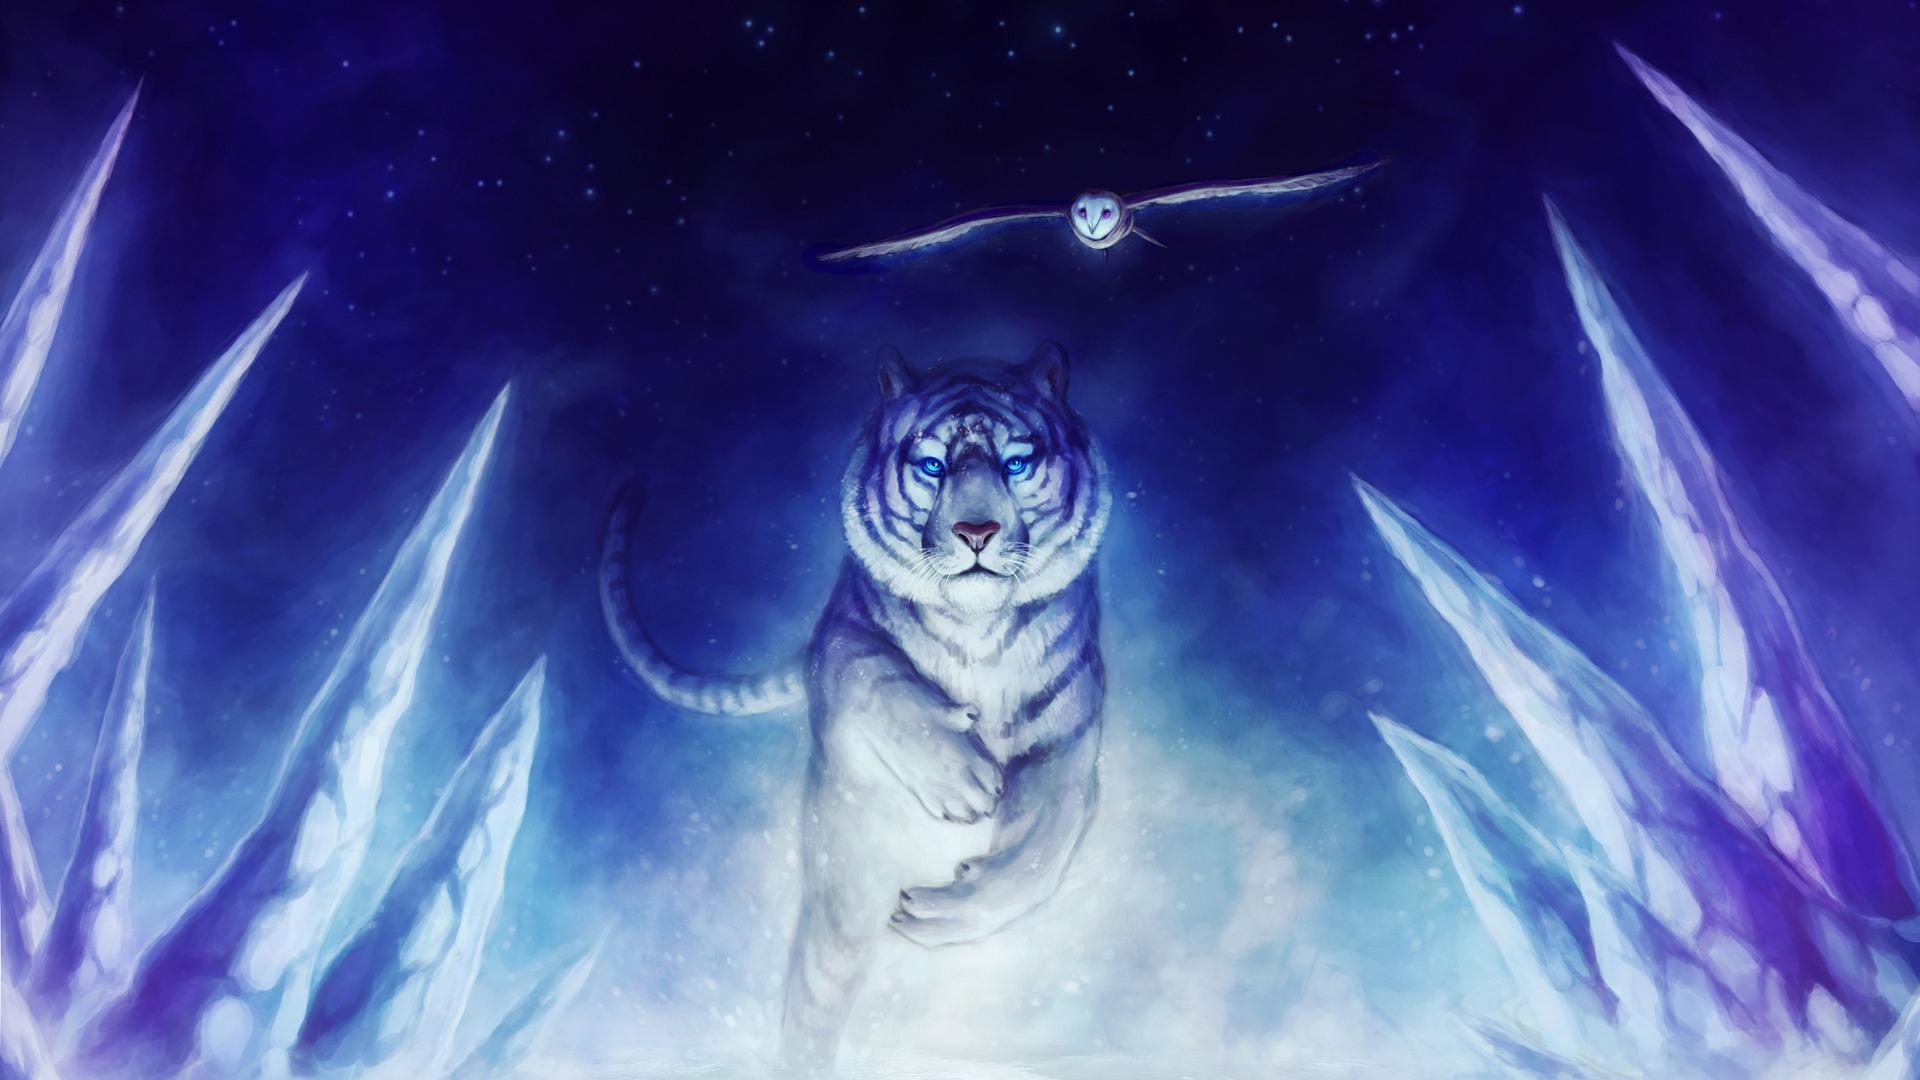 1920x1080 Tiger Owl 4k Laptop Full HD 1080P HD 4k Wallpapers